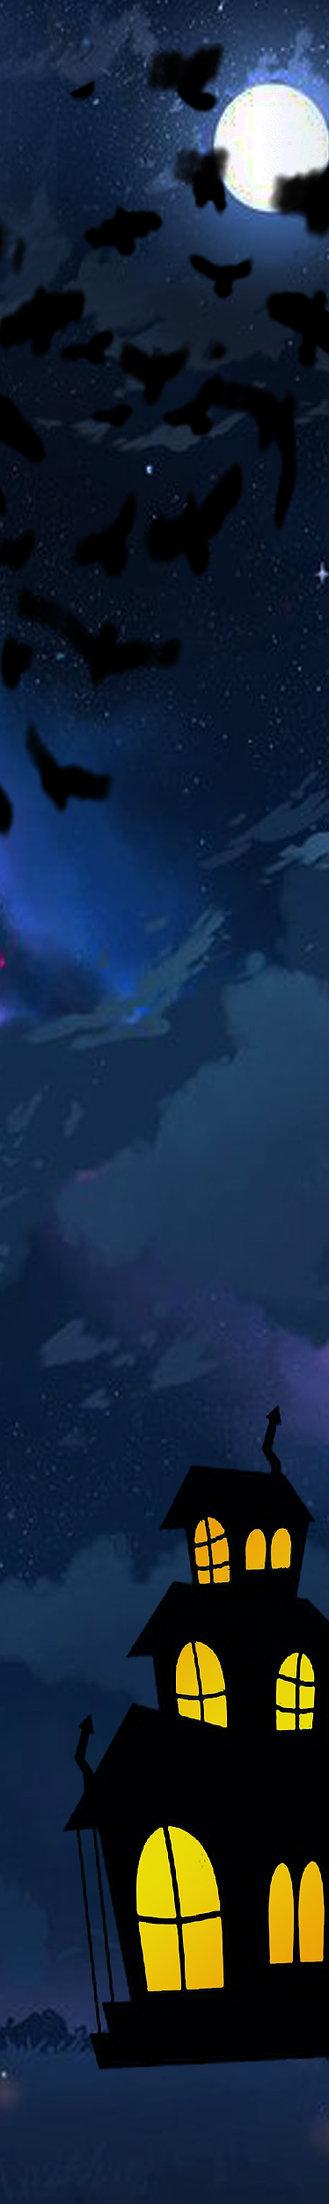 POLS 2020 Background-WEB.jpg